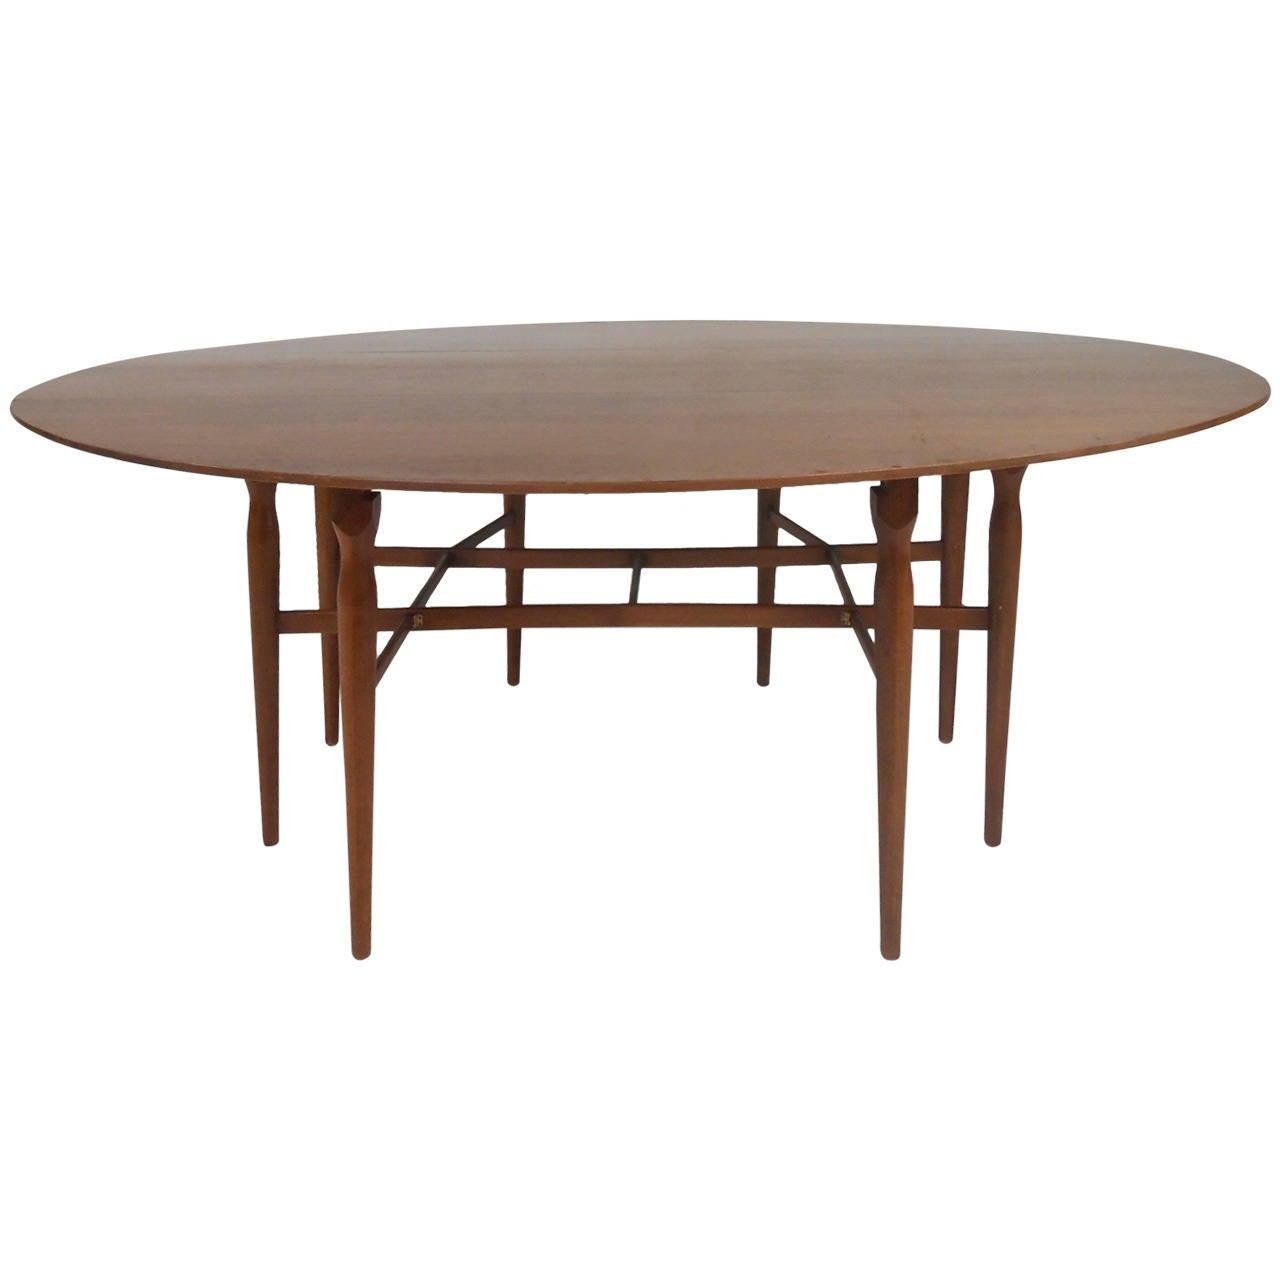 Oval Drop Leaf Table Fantastic 19thc Early Walnut Oval  : 1209066l from amlibgroup.com size 1280 x 1280 jpeg 49kB